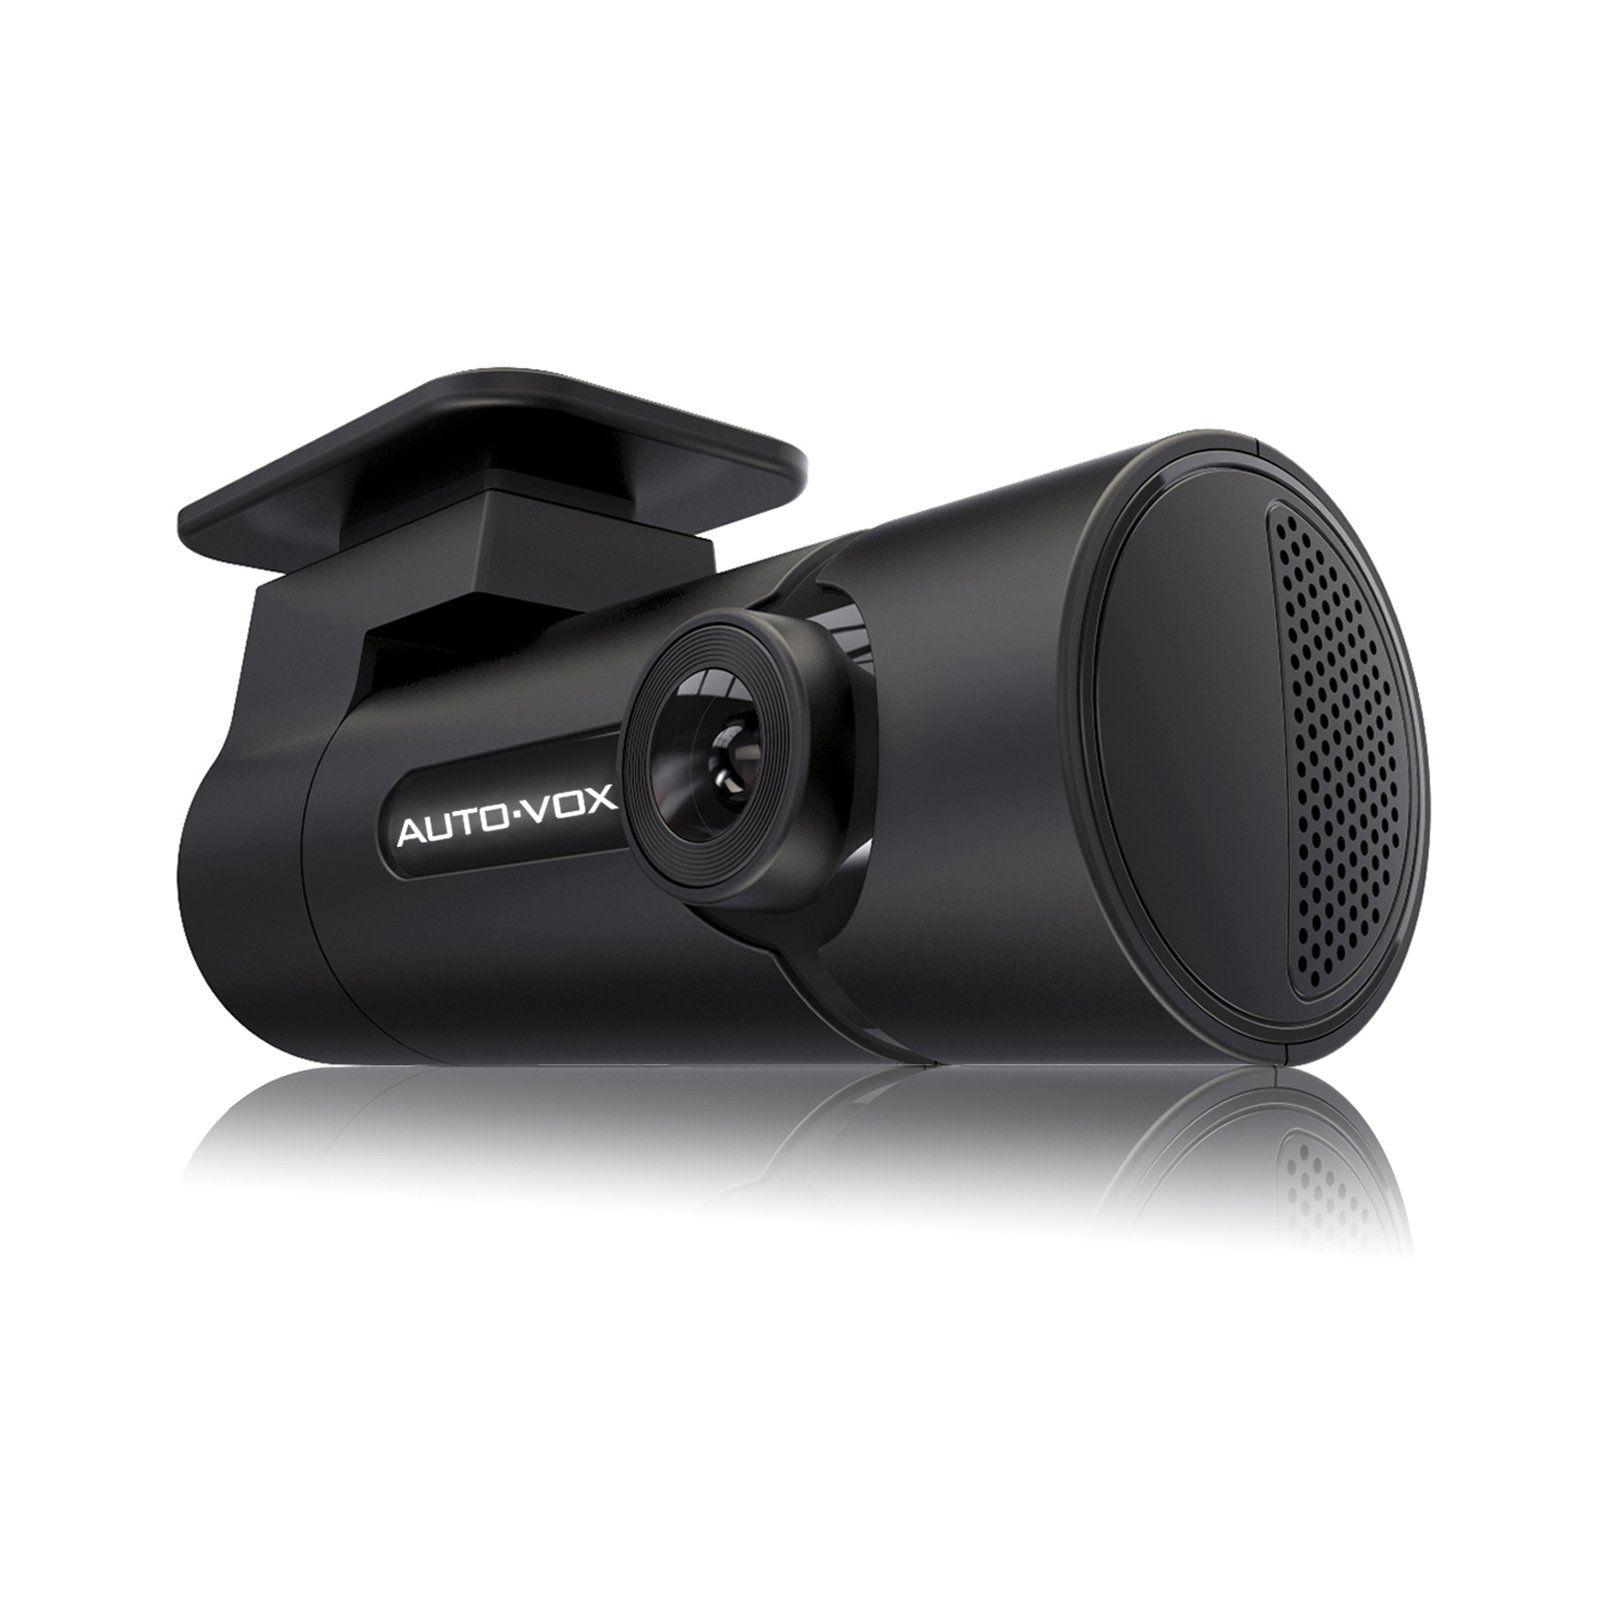 Autovox wifi dash cam d6 mini hd dashboard camera